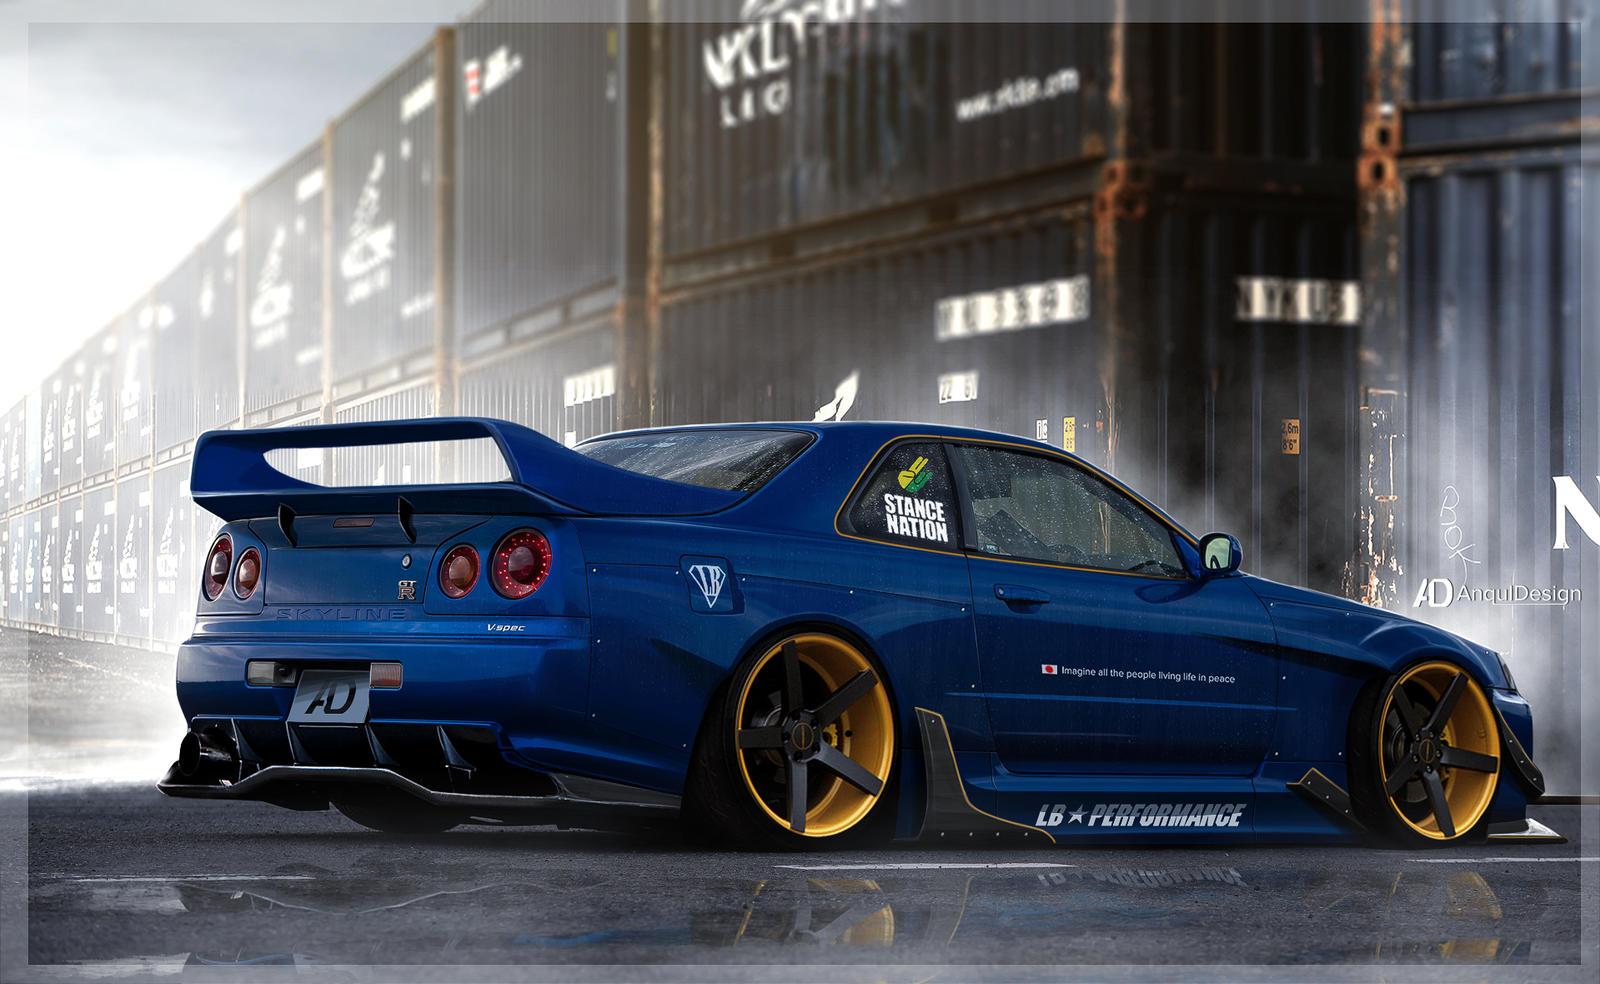 Nissan Skyline r34 LB